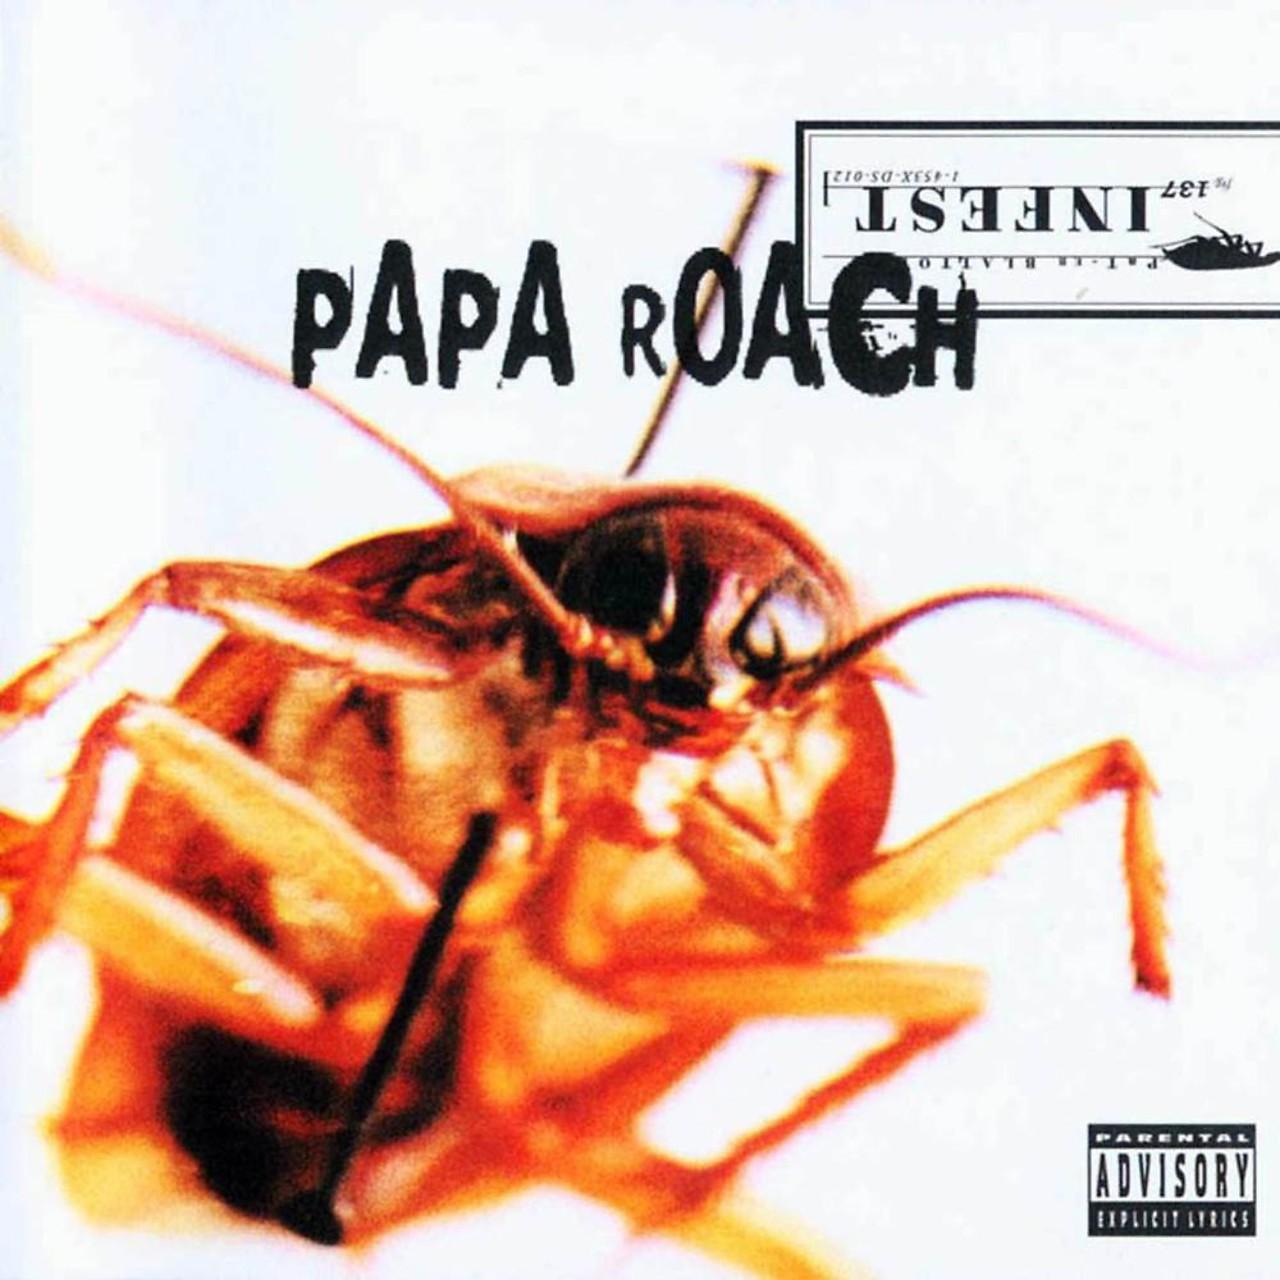 Download album papa roach the connection